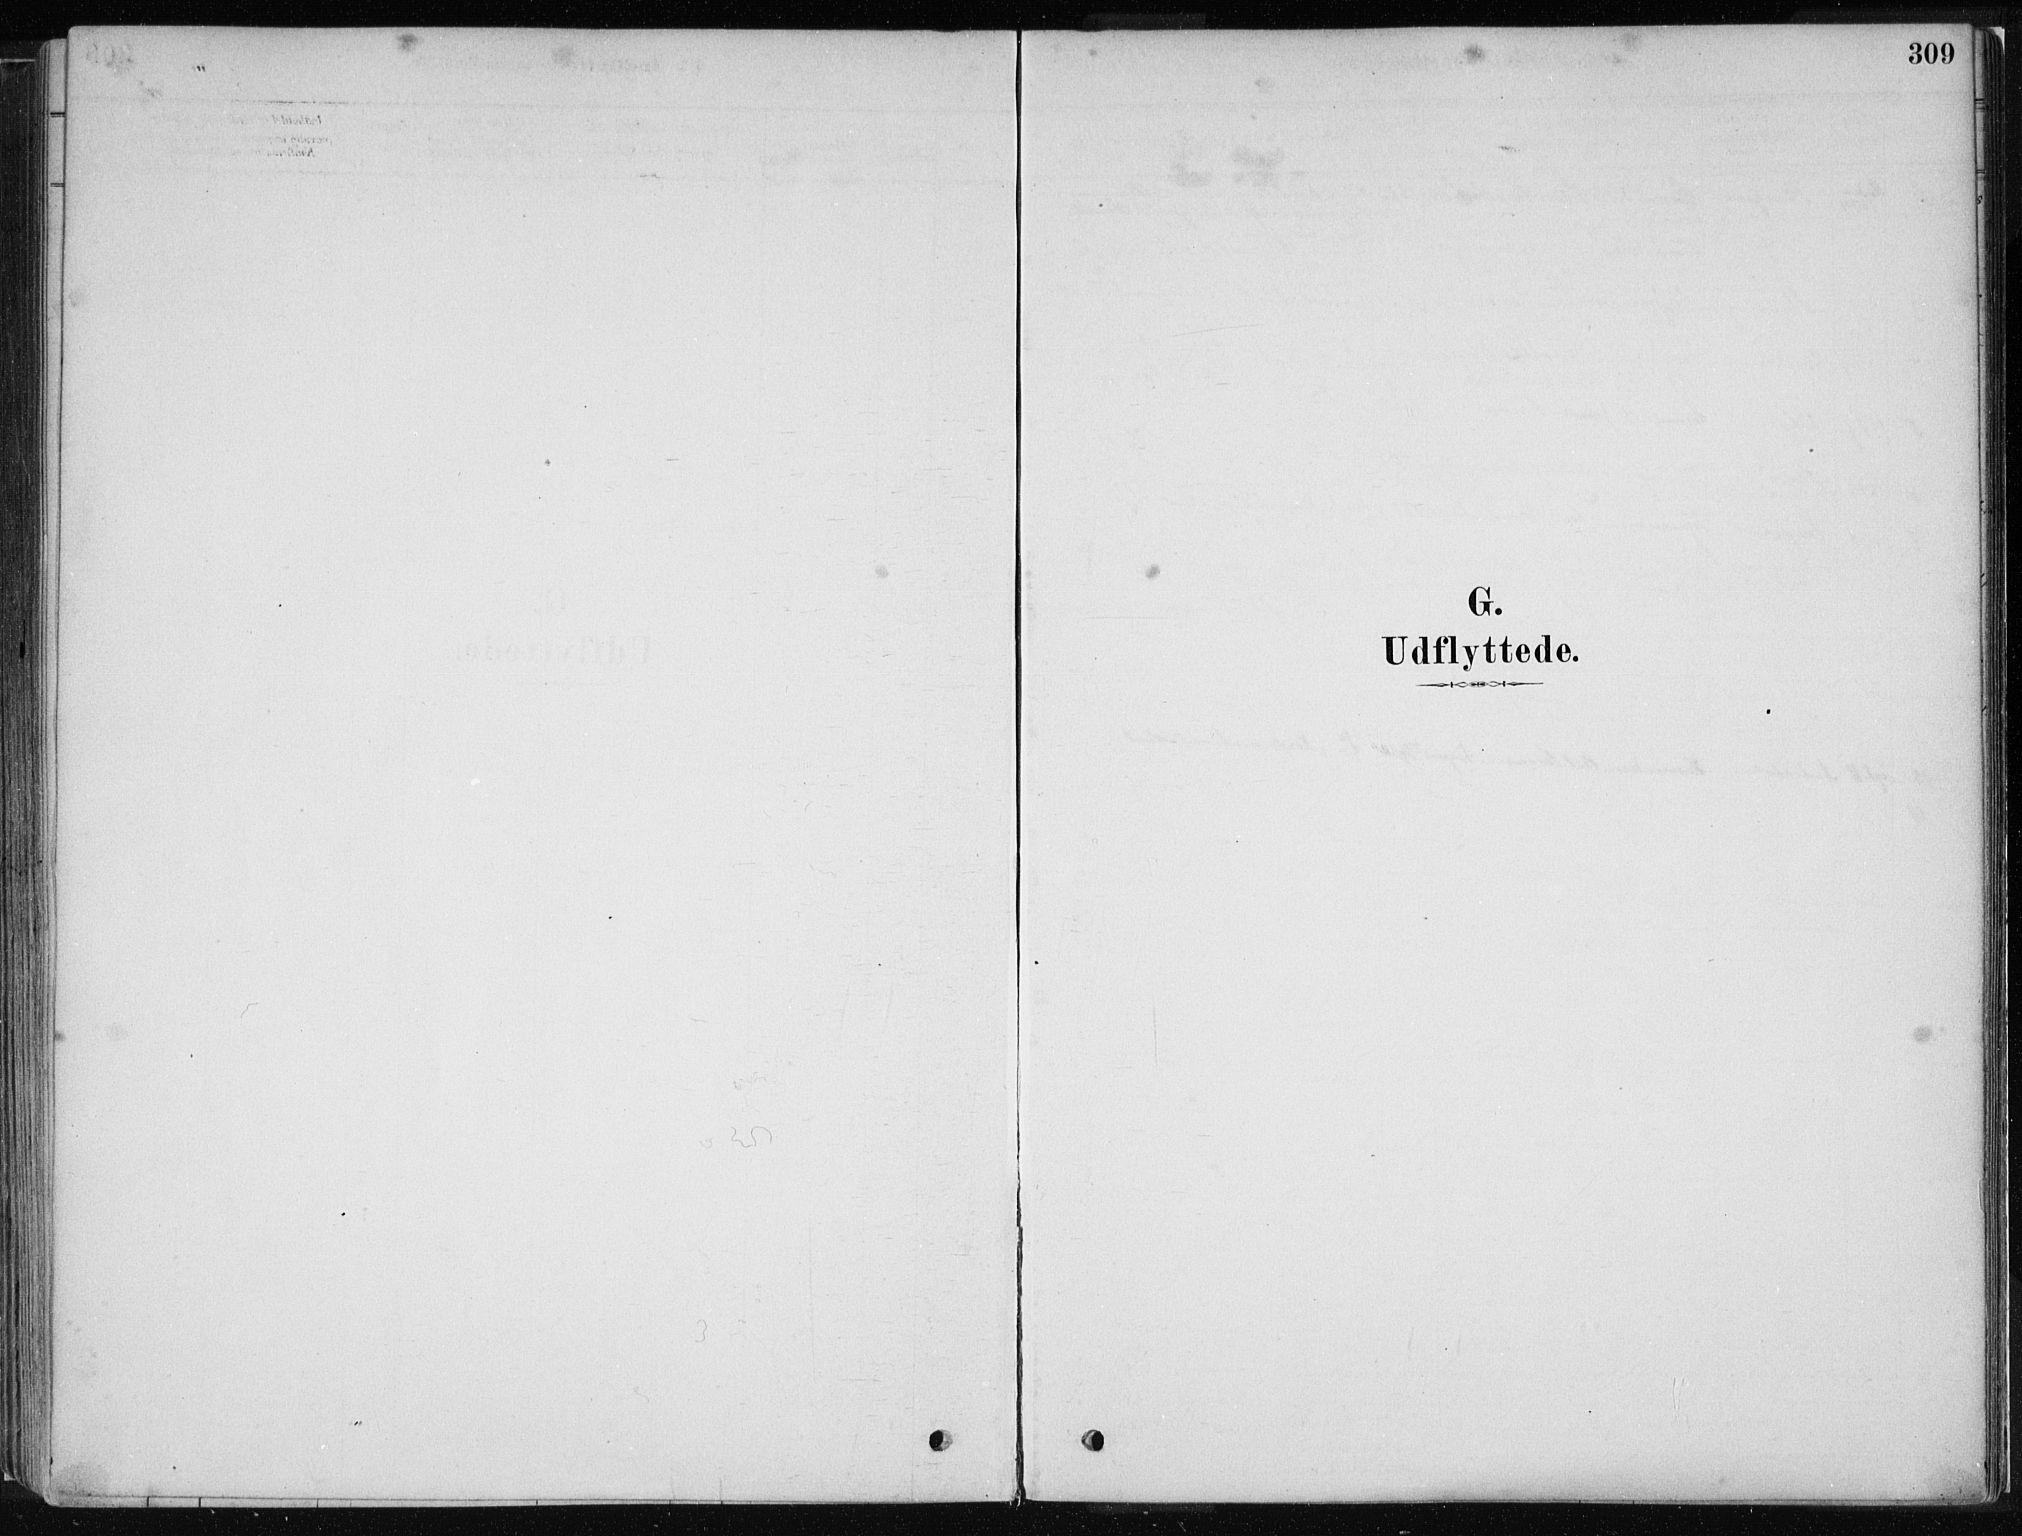 SAB, Stord sokneprestembete, H/Haa: Ministerialbok nr. B 2, 1878-1913, s. 309